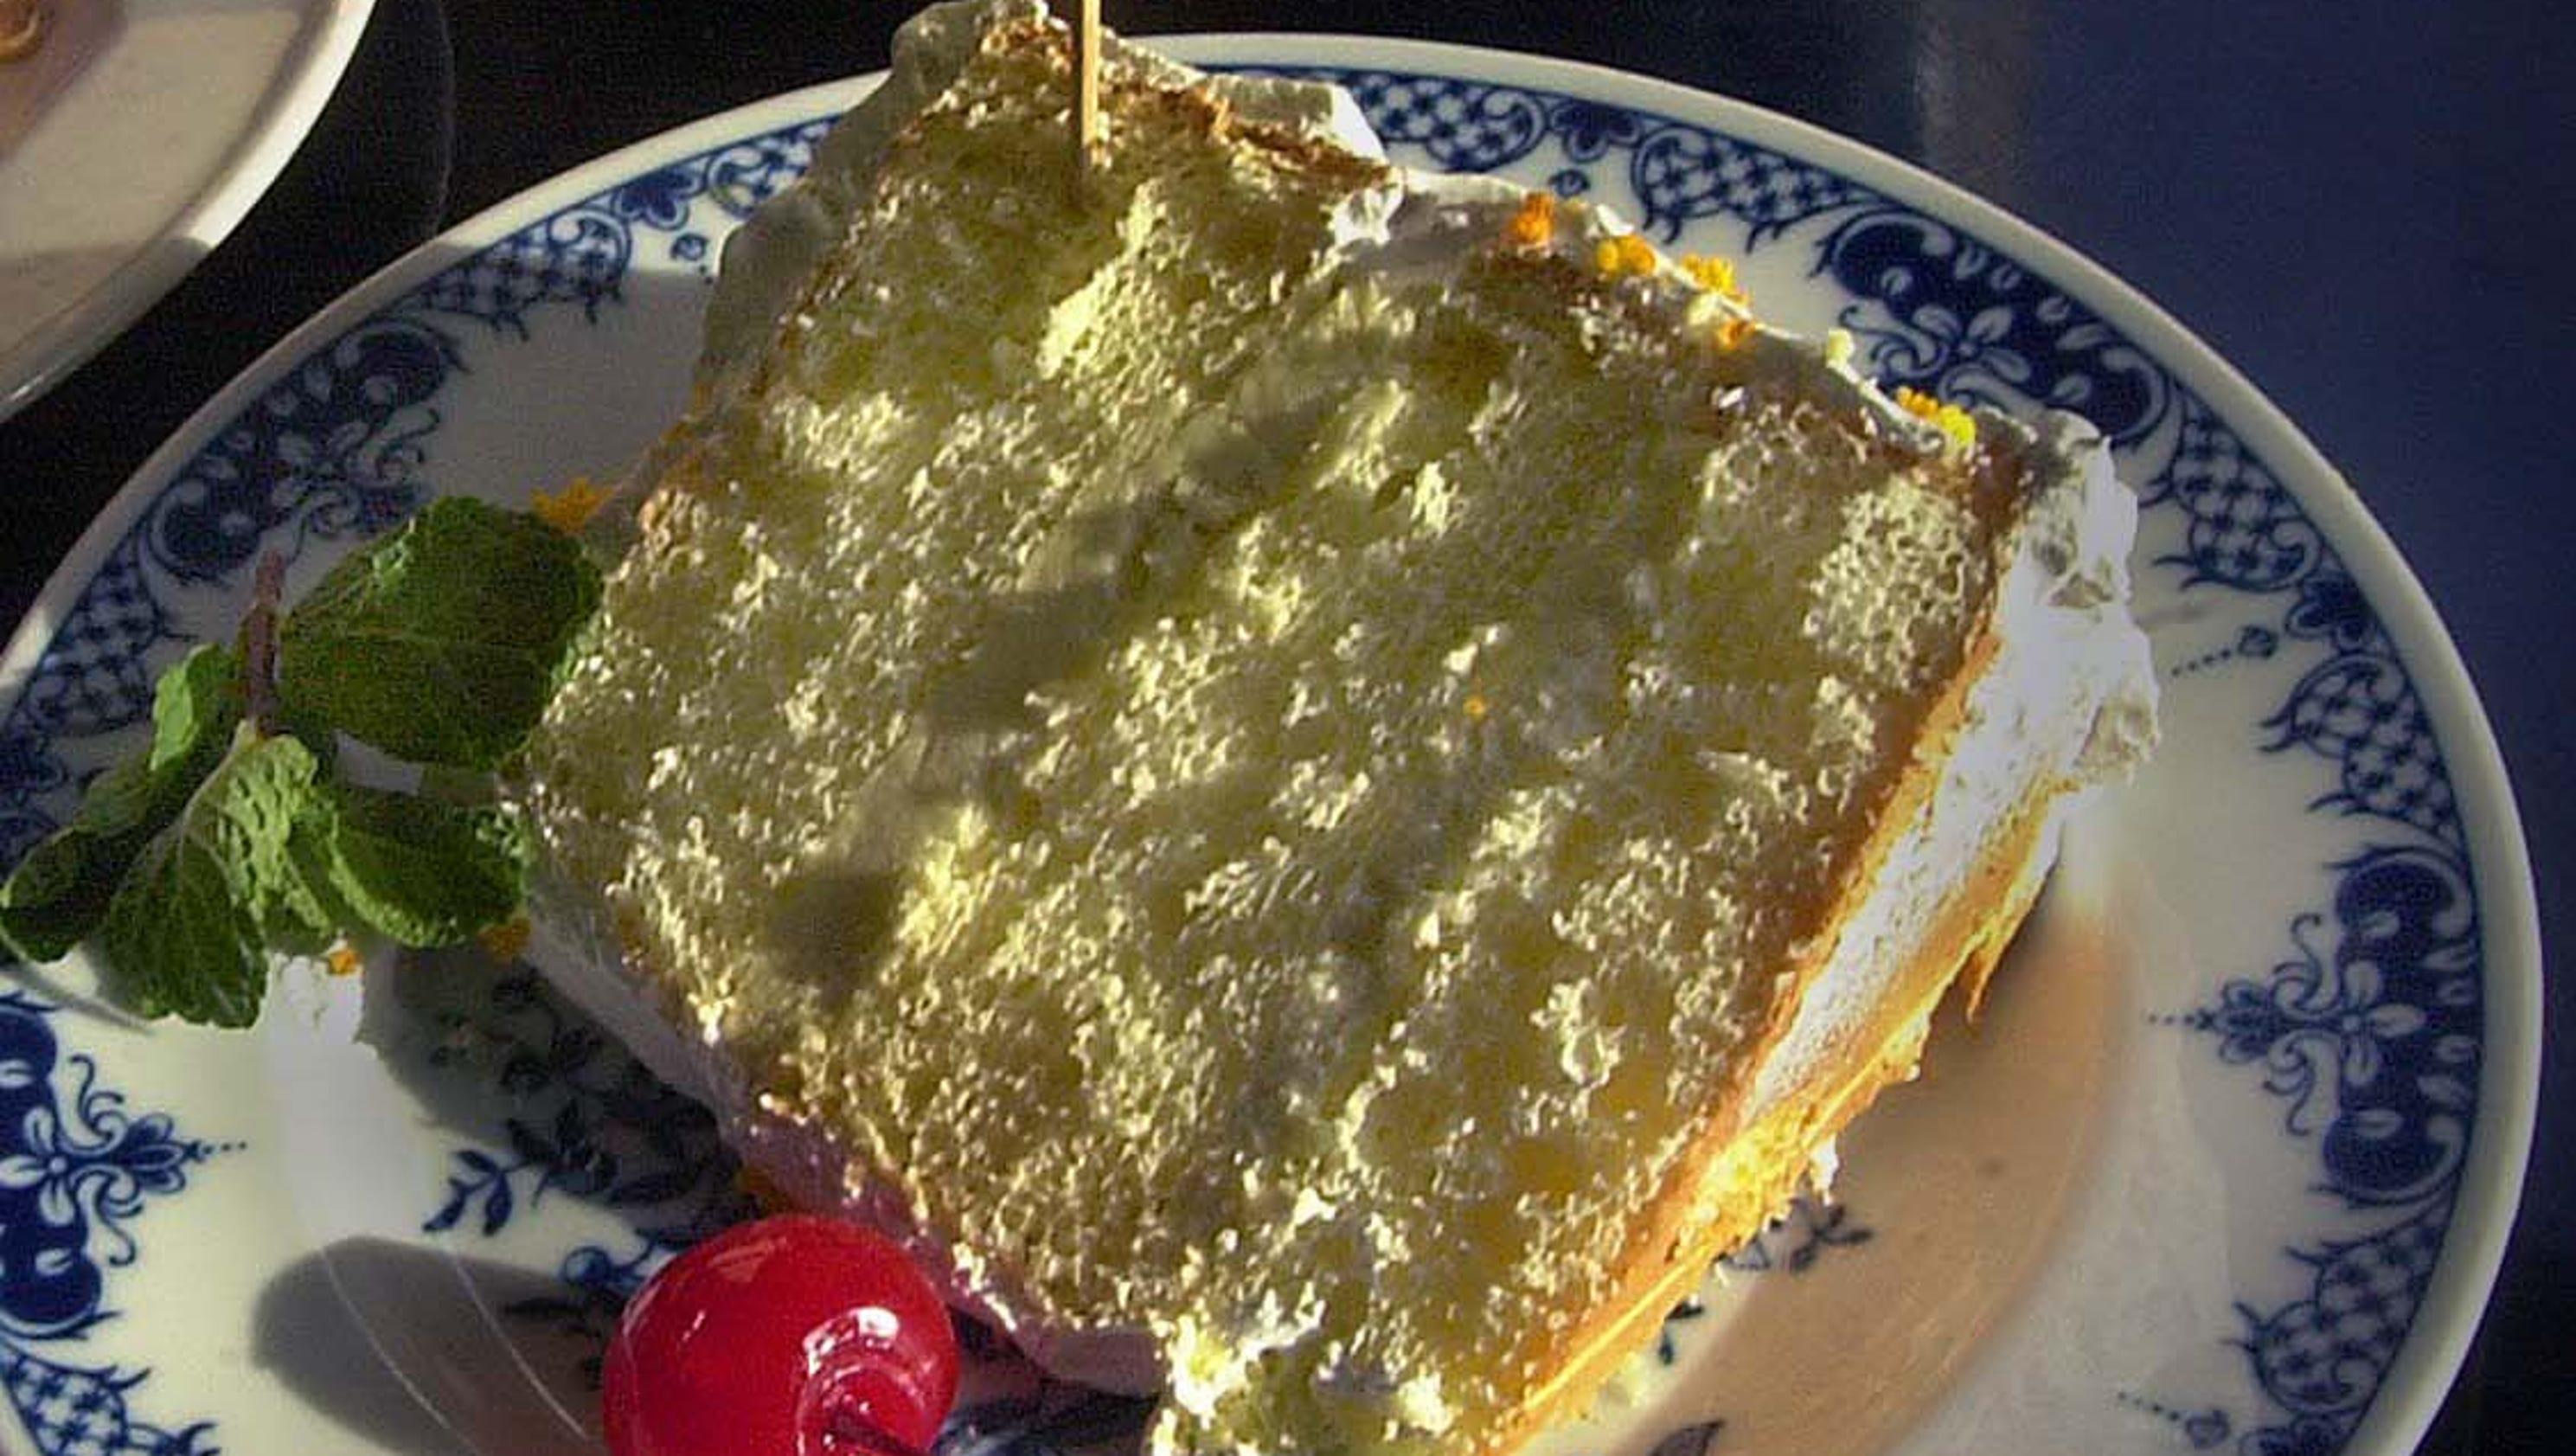 Watts Tea Room Sunshine Cake